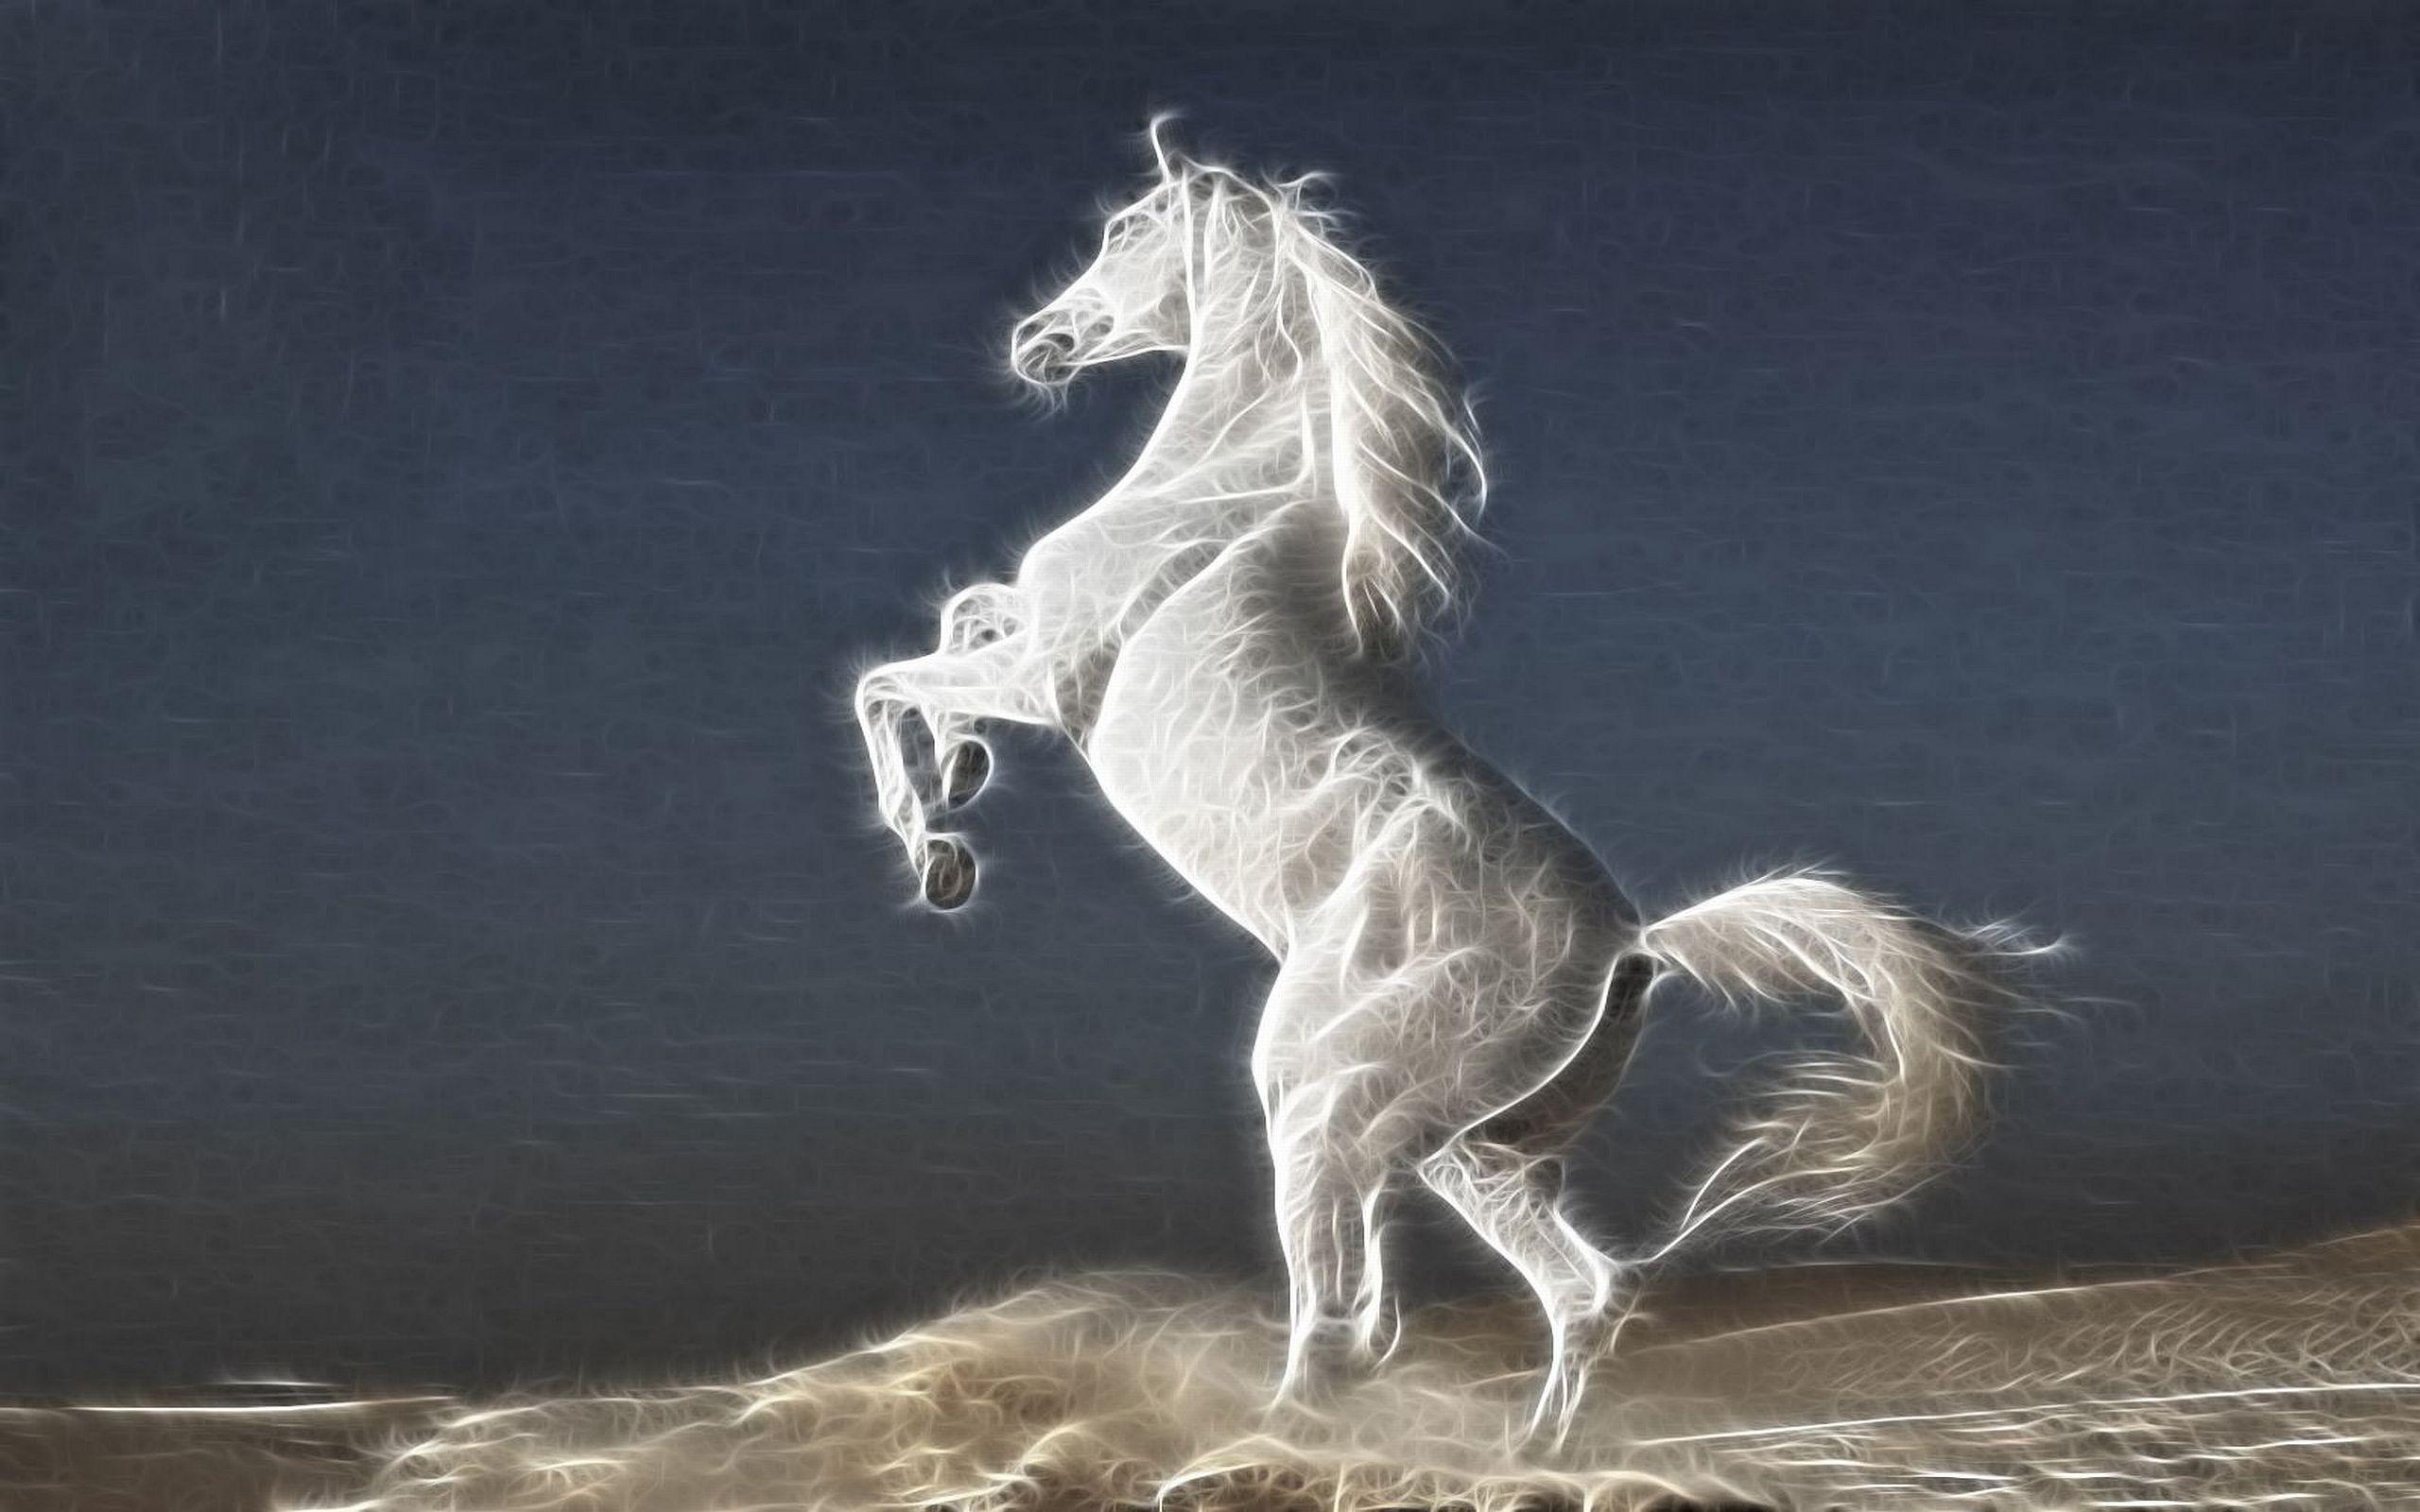 3d Gold Man Desktop Wallpaper Latest Fashion Trends White Stallion Horse Ipad Hd Wallpaper